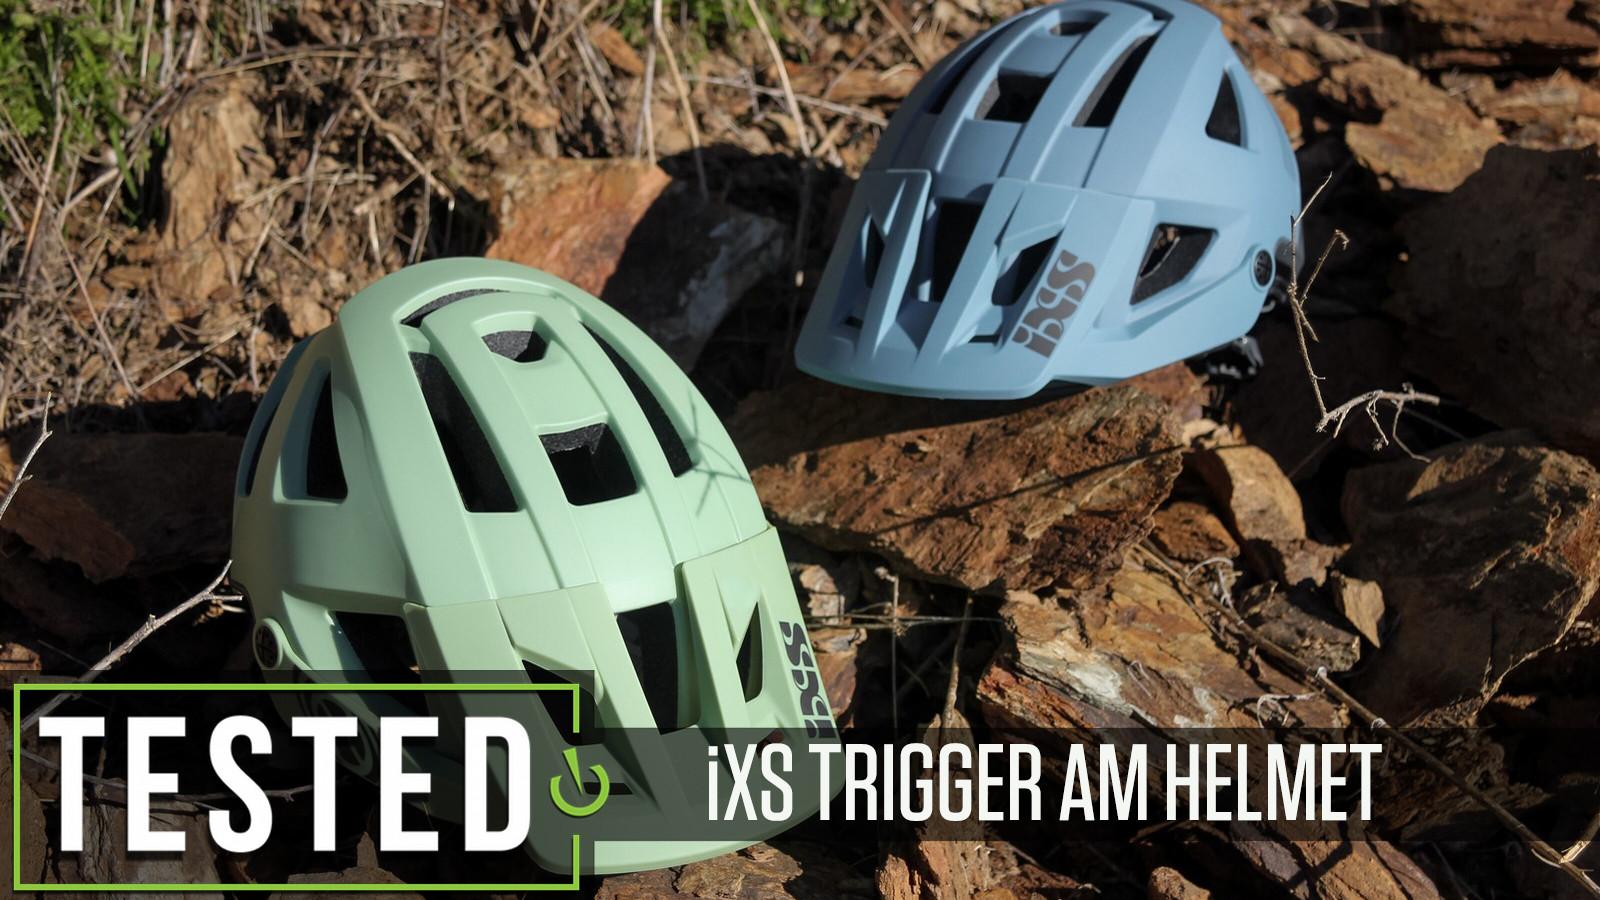 Tested: iXS Trigger AM Helmet